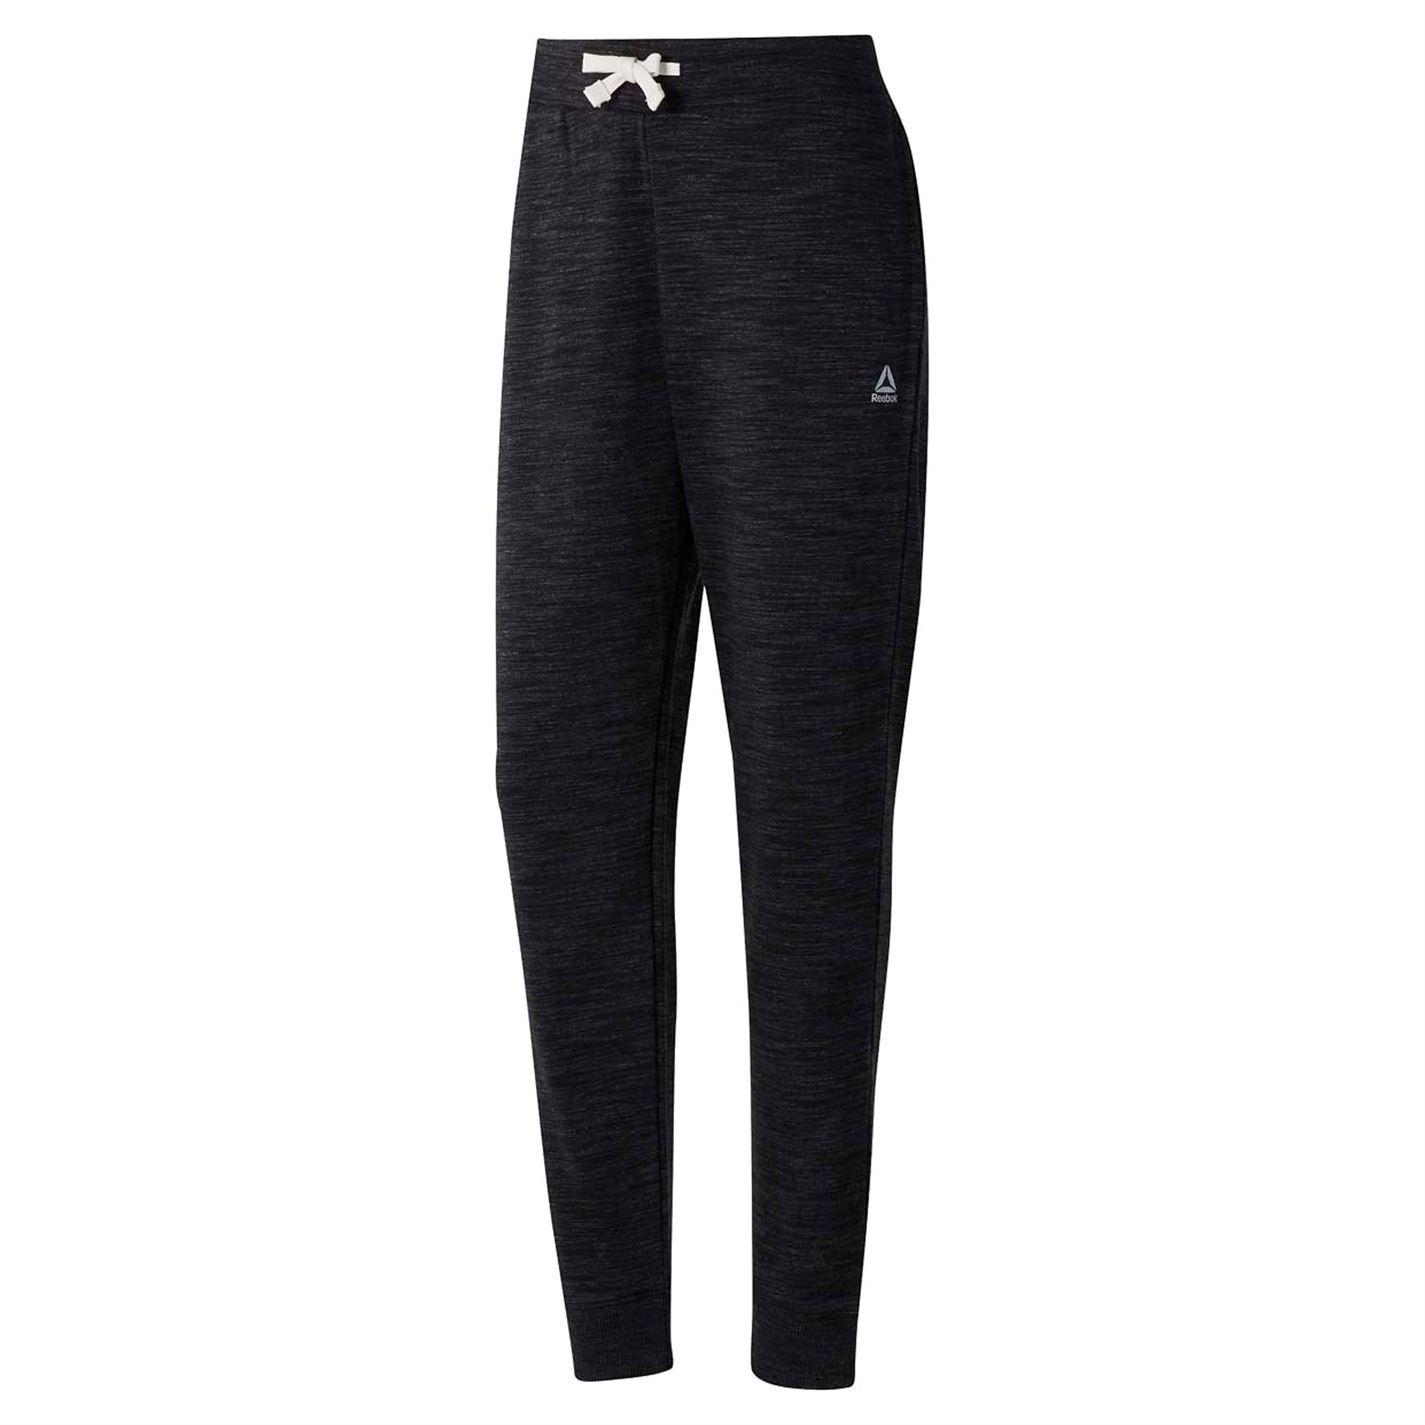 Dámske fleecové oblečenie Reebok Marble Closed Hem Jogging Pants Ladies. 1 a9d0ea0c070